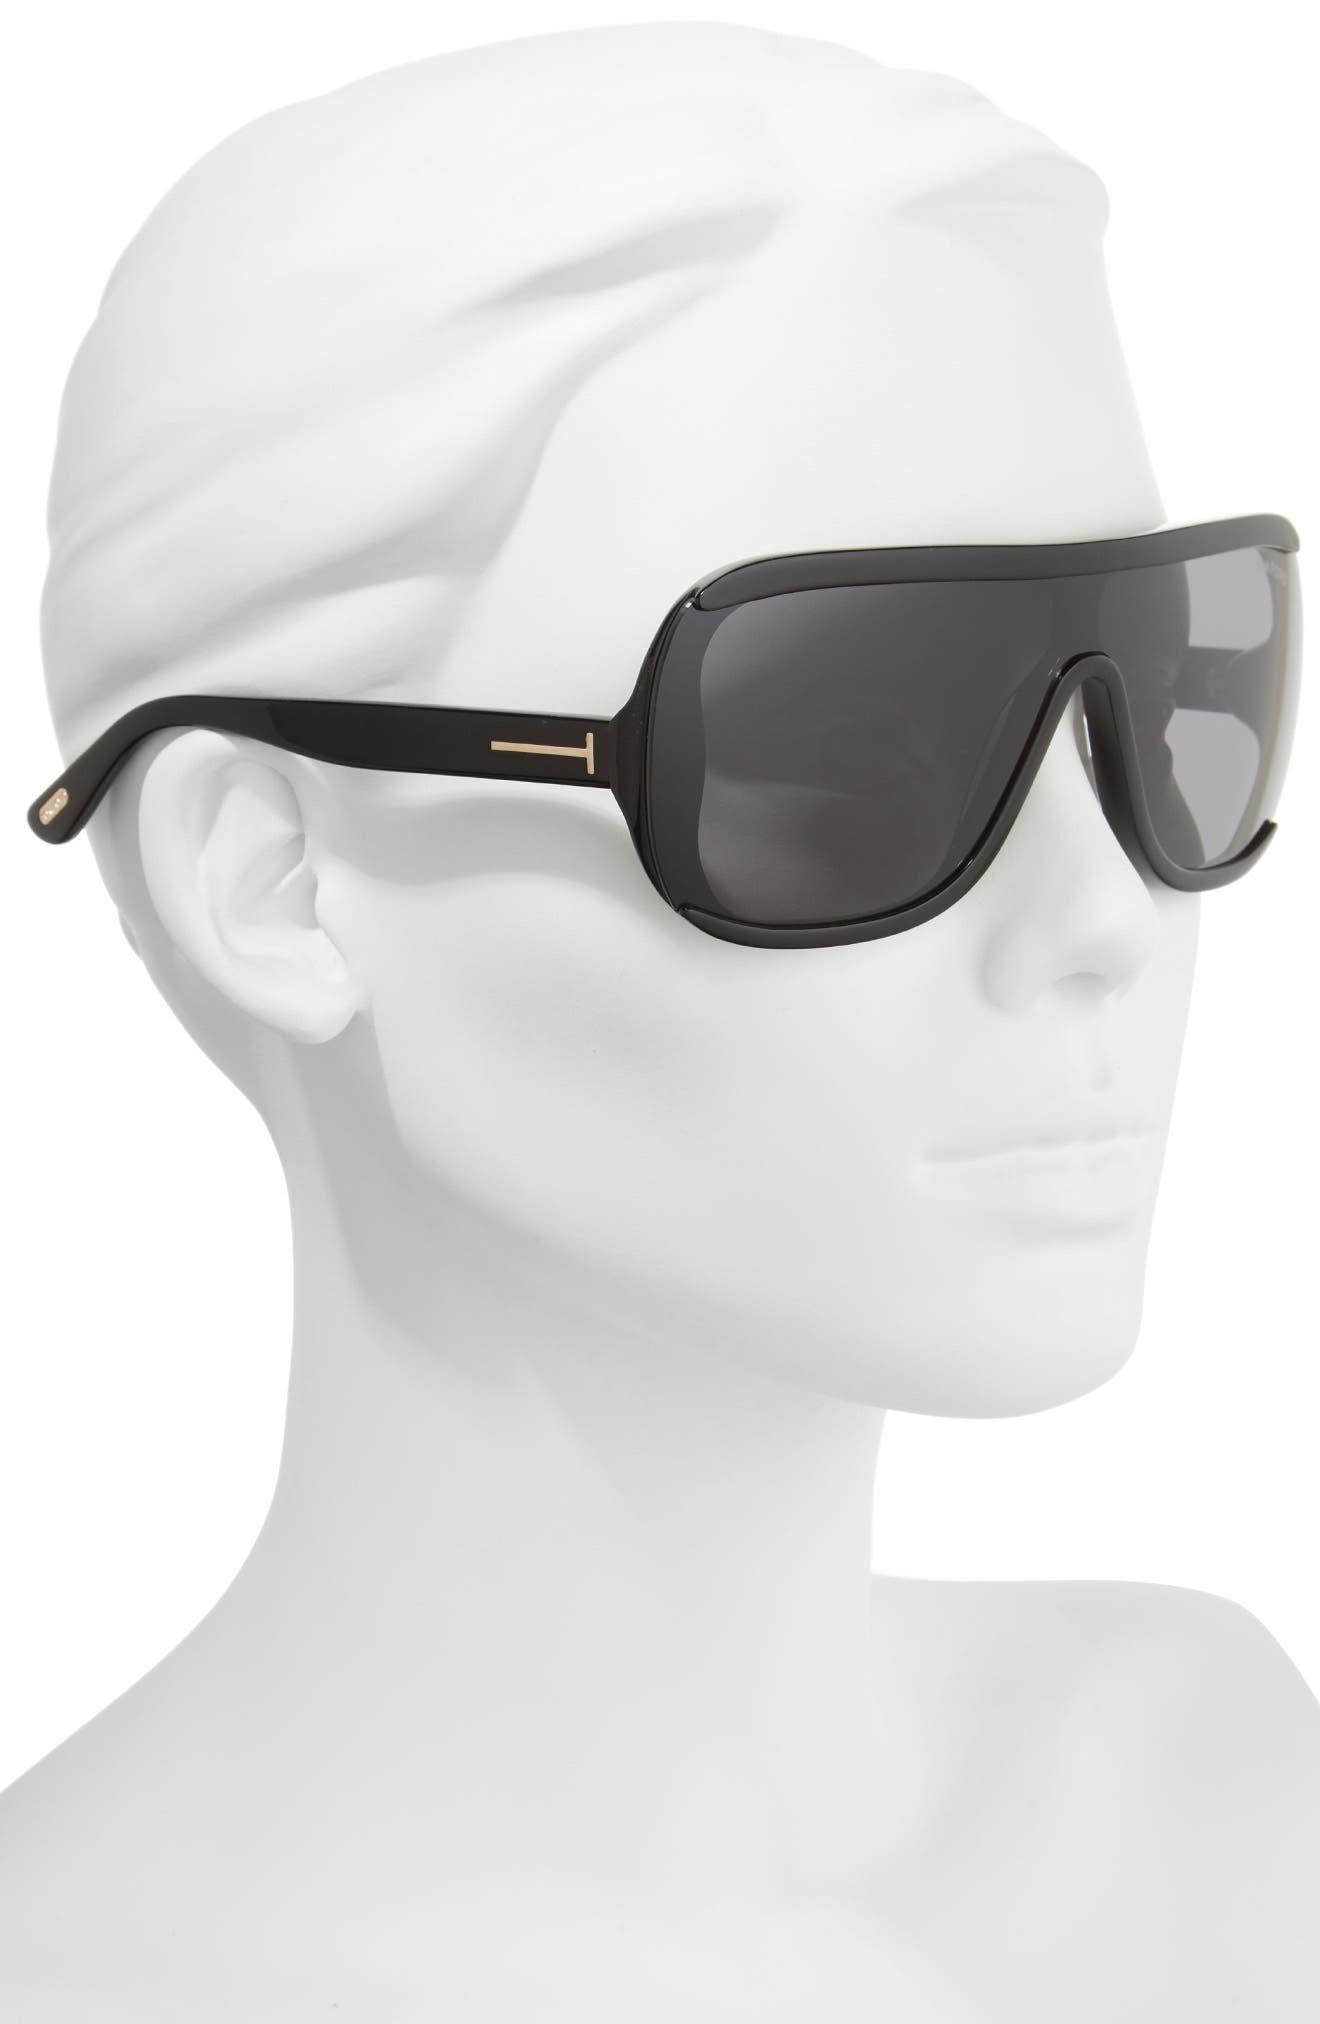 TOM FORD,                             Porfirio 65mm One-Piece Lens Shield Sunglasses,                             Alternate thumbnail 2, color,                             001